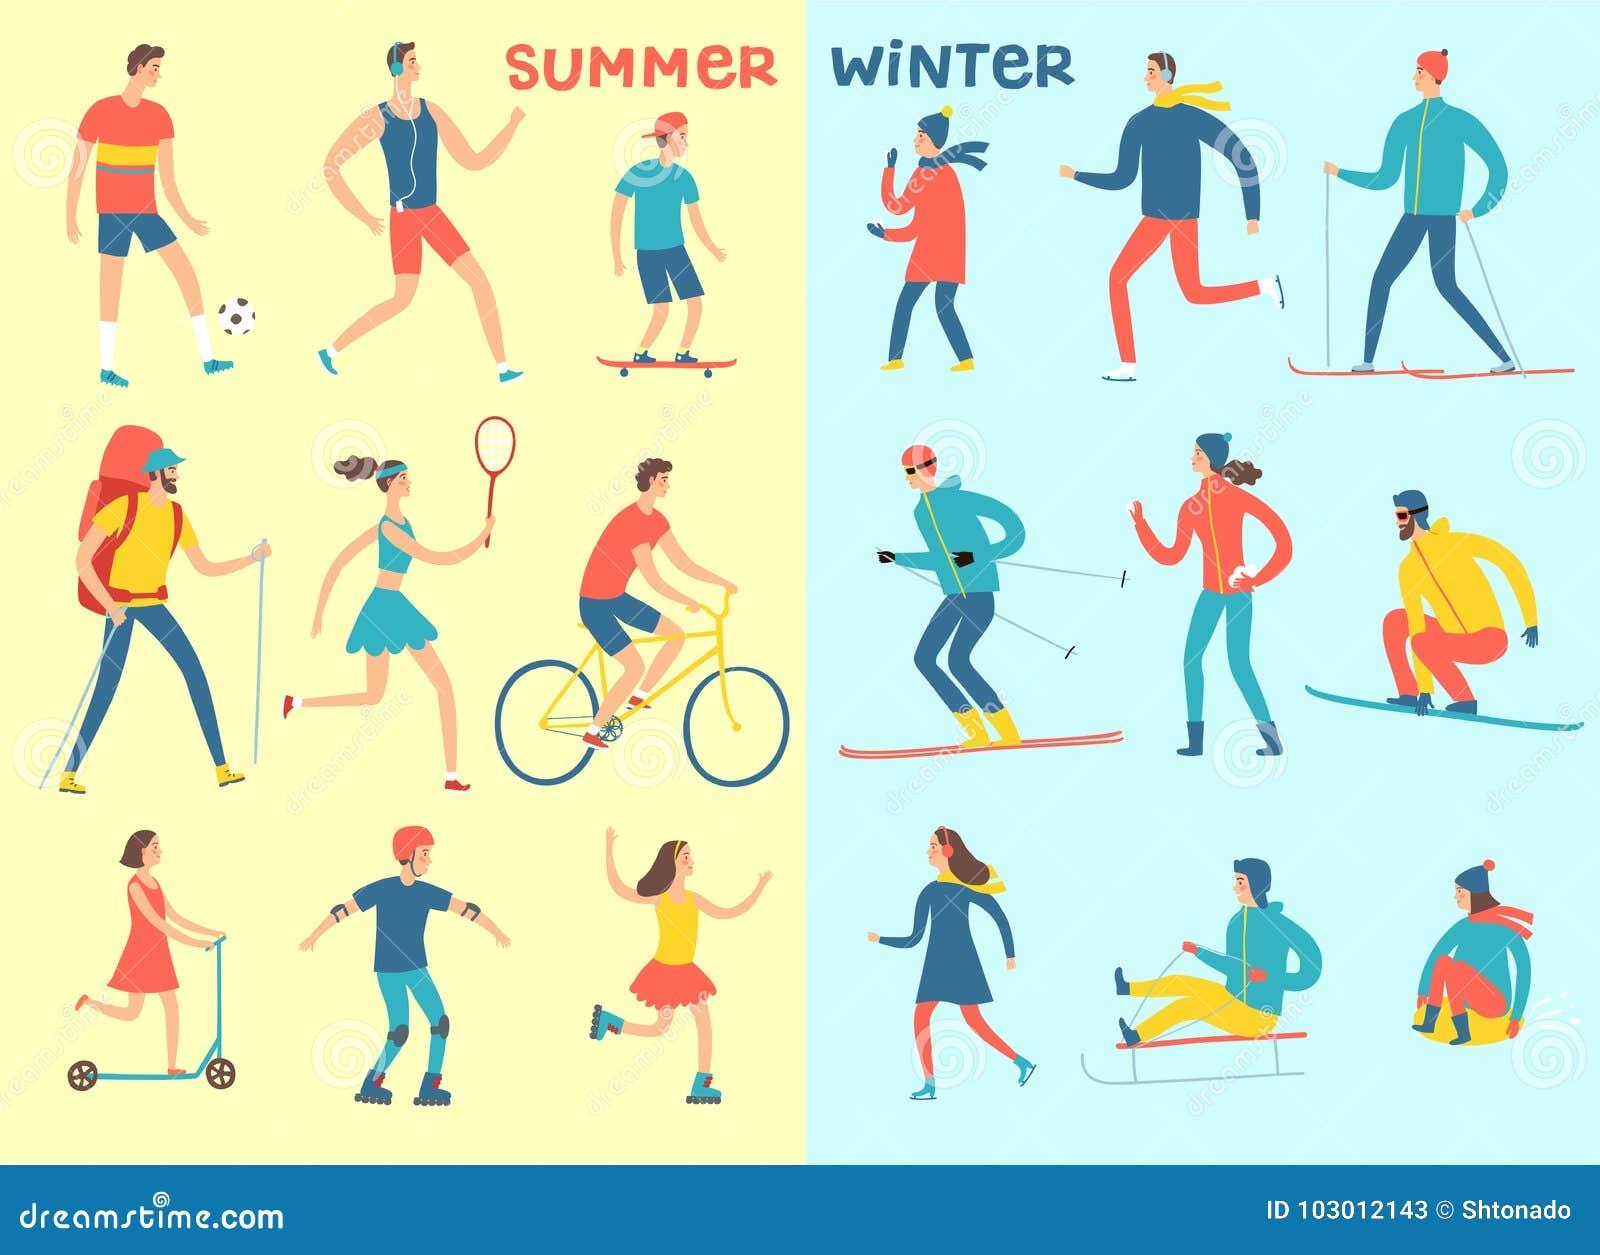 Winter And Summer Activities Cartoon Set